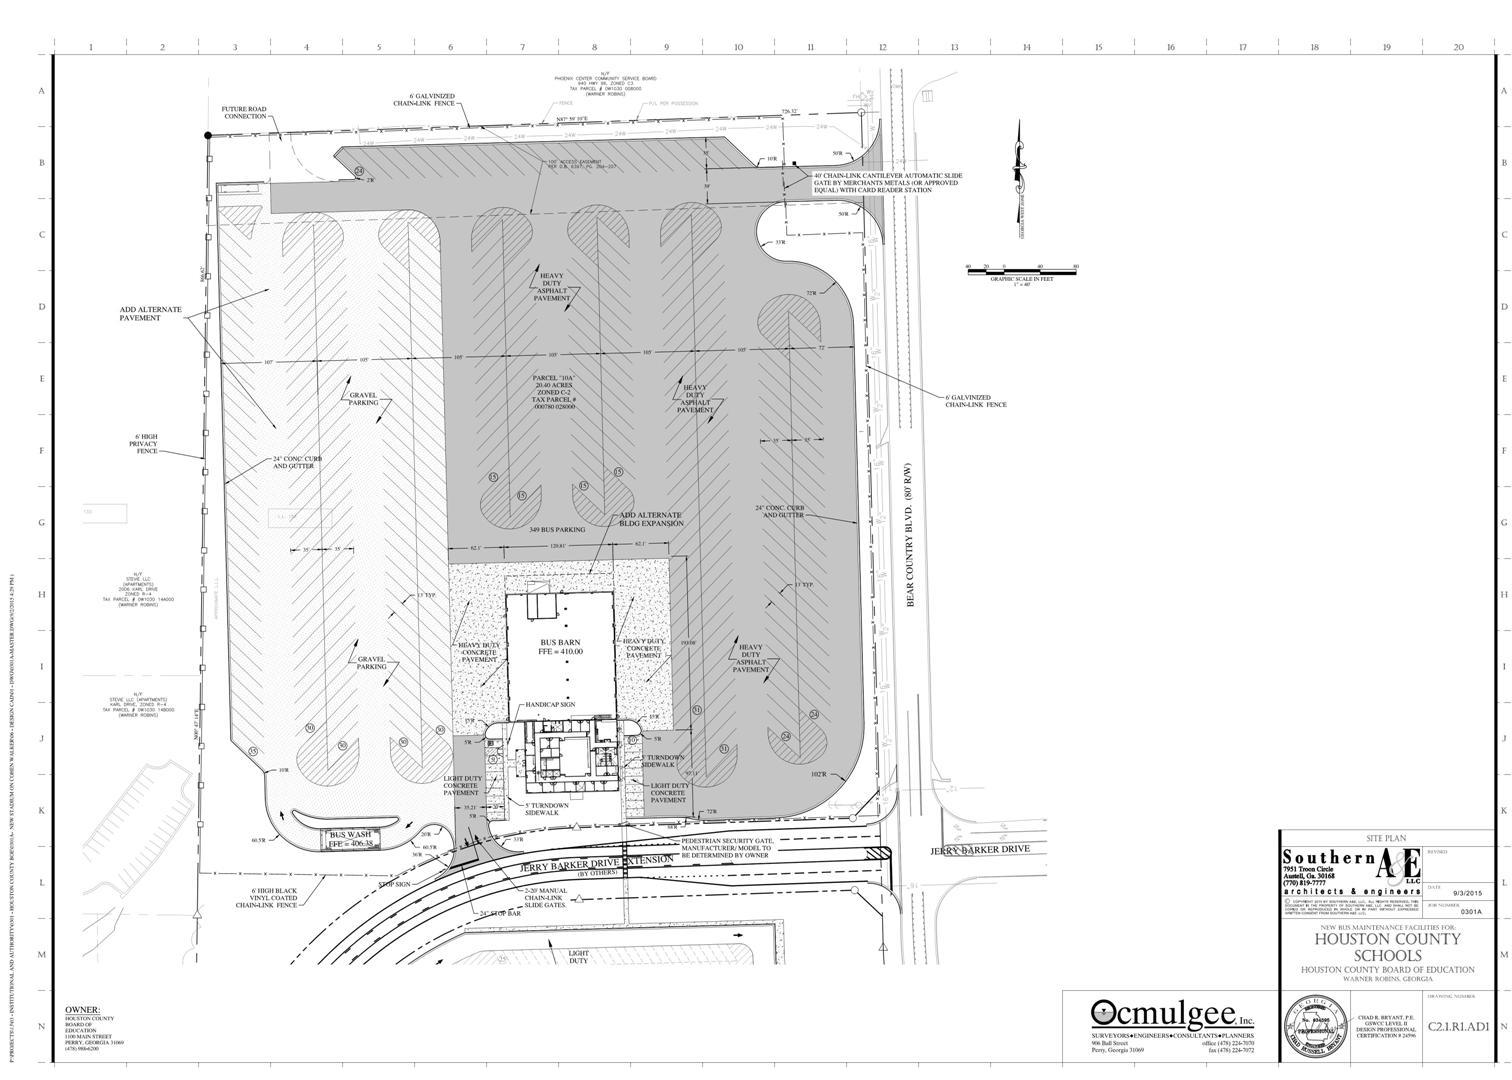 Central Bus Facility Site Plan